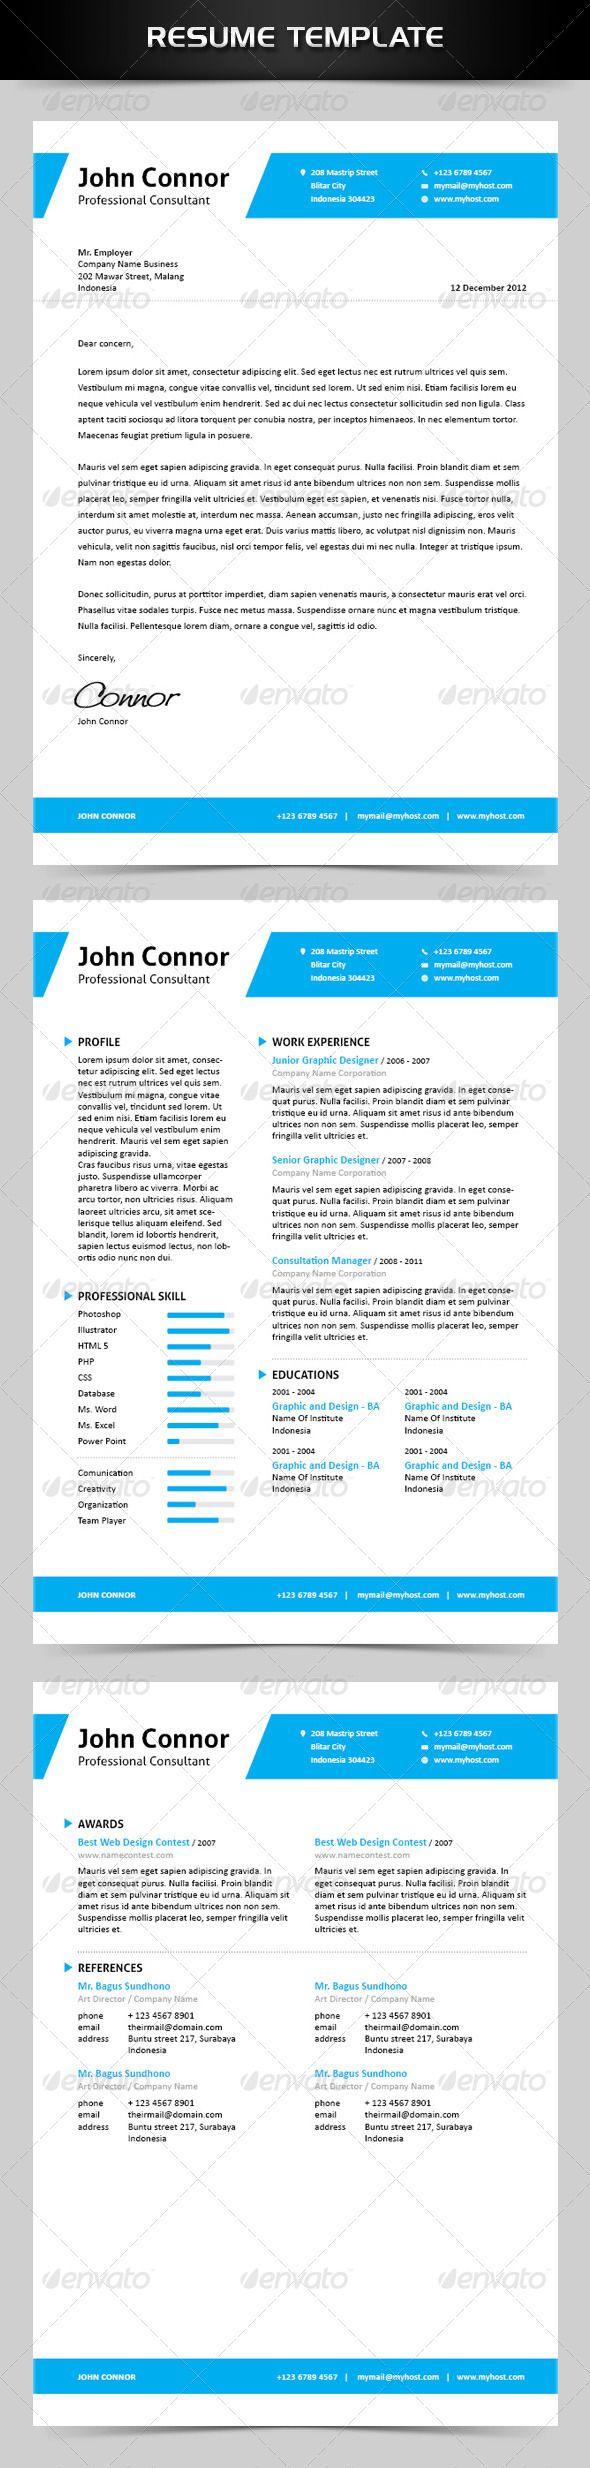 Simple Resume Exampleprin 1749 Best Minimal Resume Images On Pinterest  Print Templates .